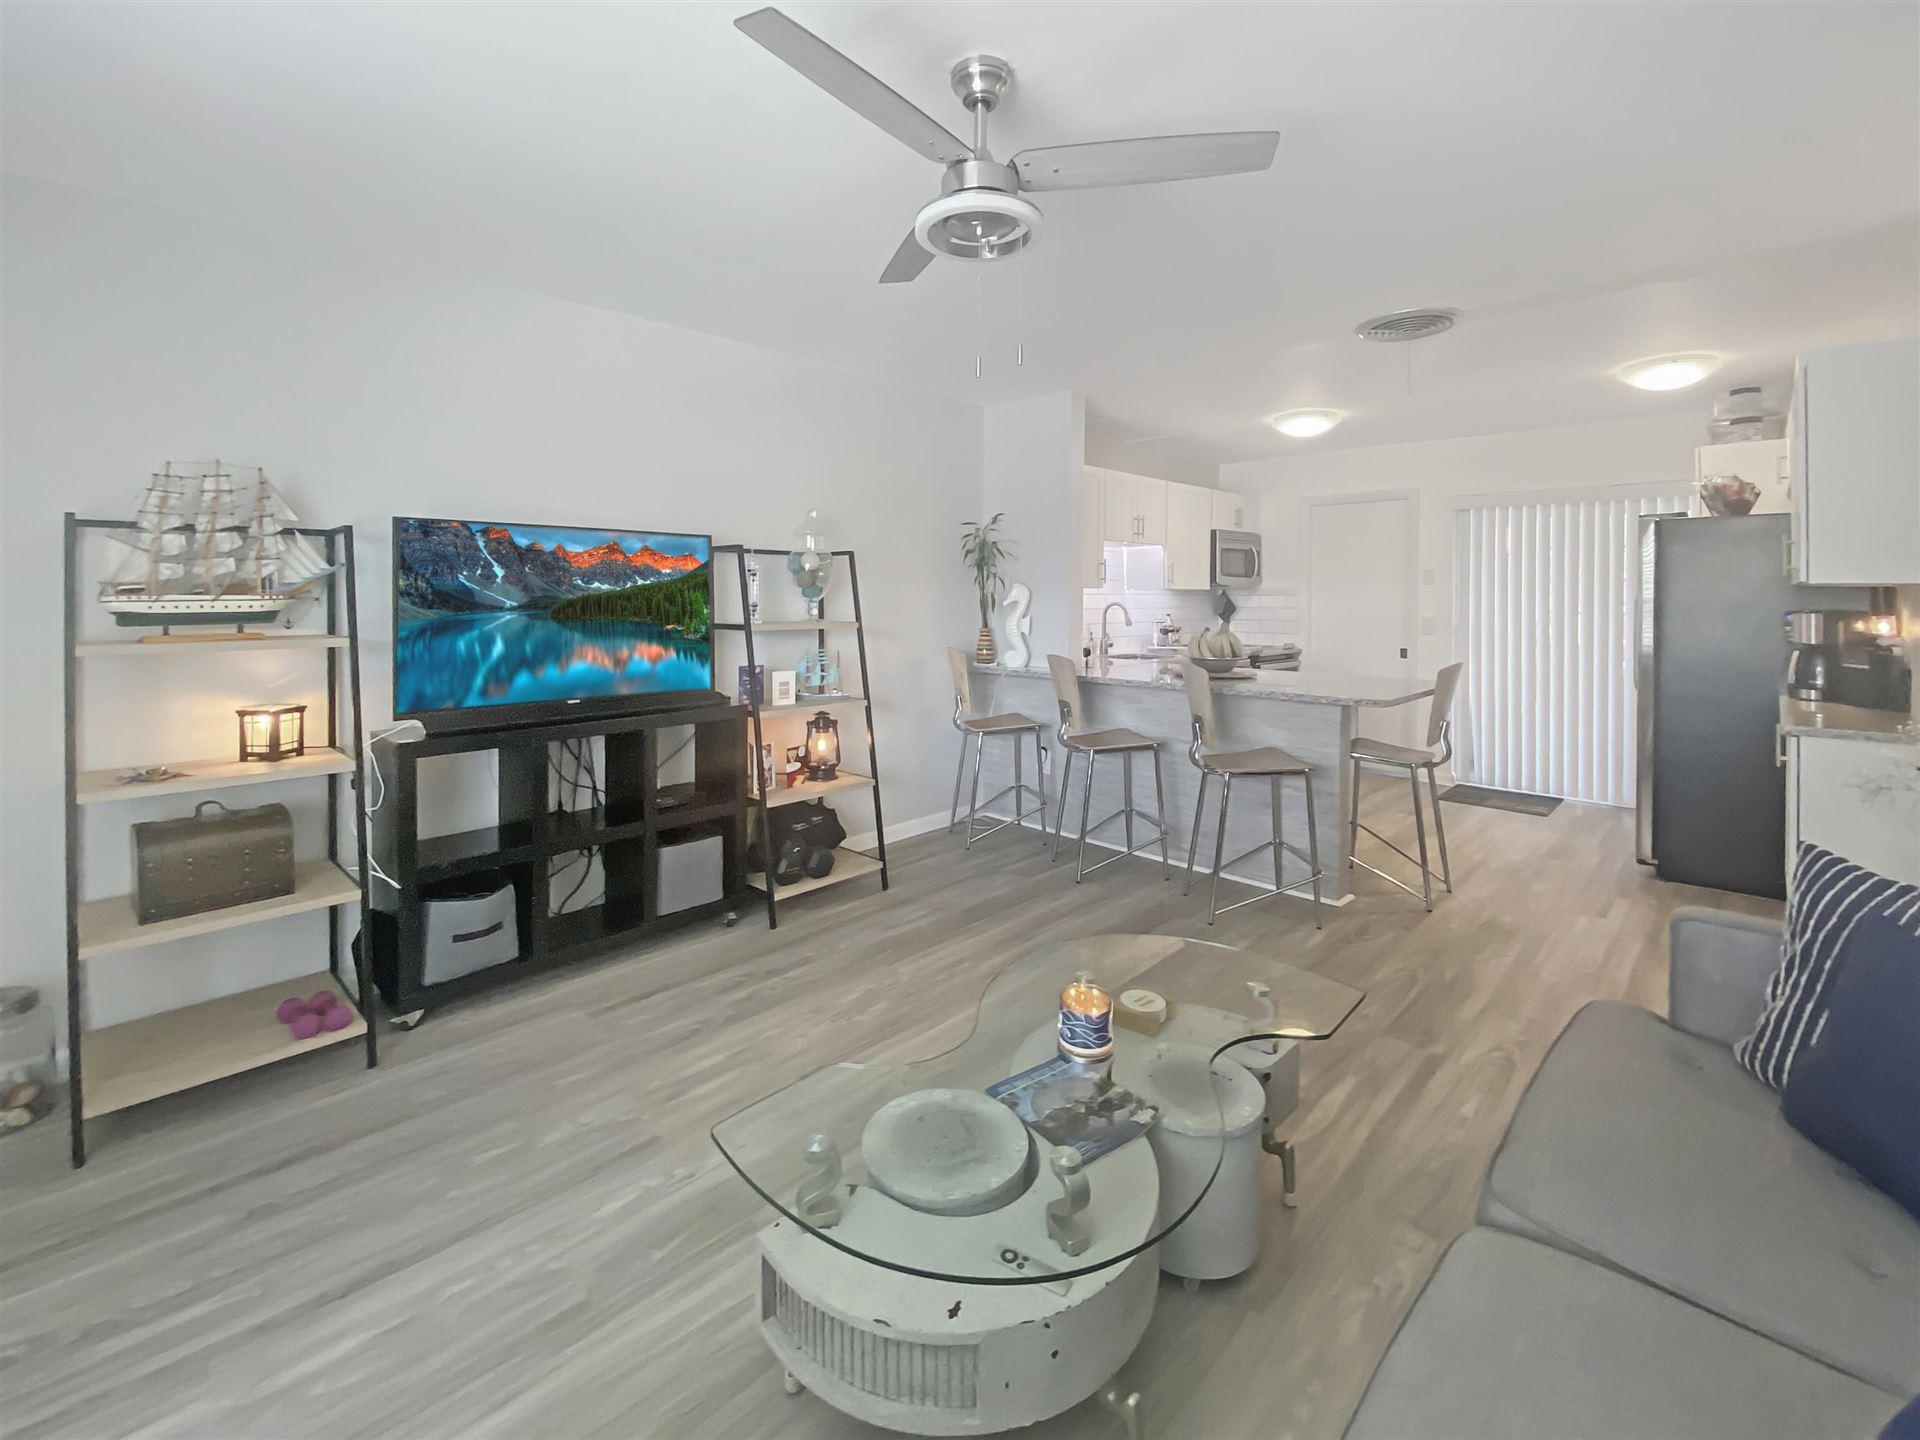 2269 NE Rustic Way, Jensen Beach, FL 34957 - #: RX-10696989